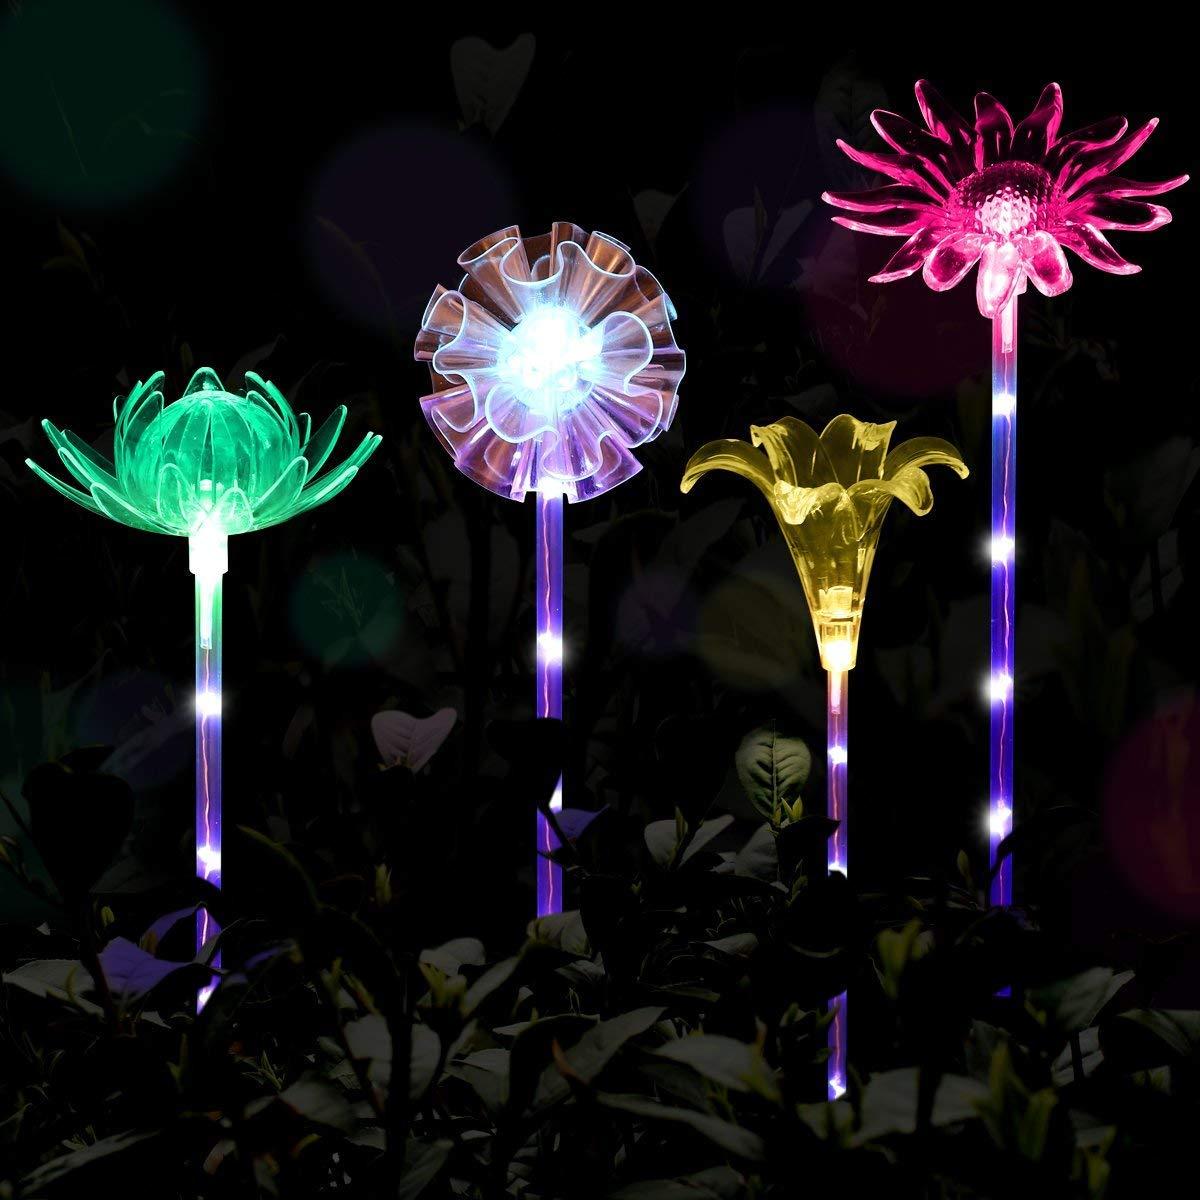 Yaoqiaoji 4pcs Solar Garden Lights Outdoor Garden Stake Lights Multi-Color Changing LED Solar Lights with Purple LED Light Stake for Garden Patio Backyard Decoration (Lotus,Dandelion,Lily,Sunflower)